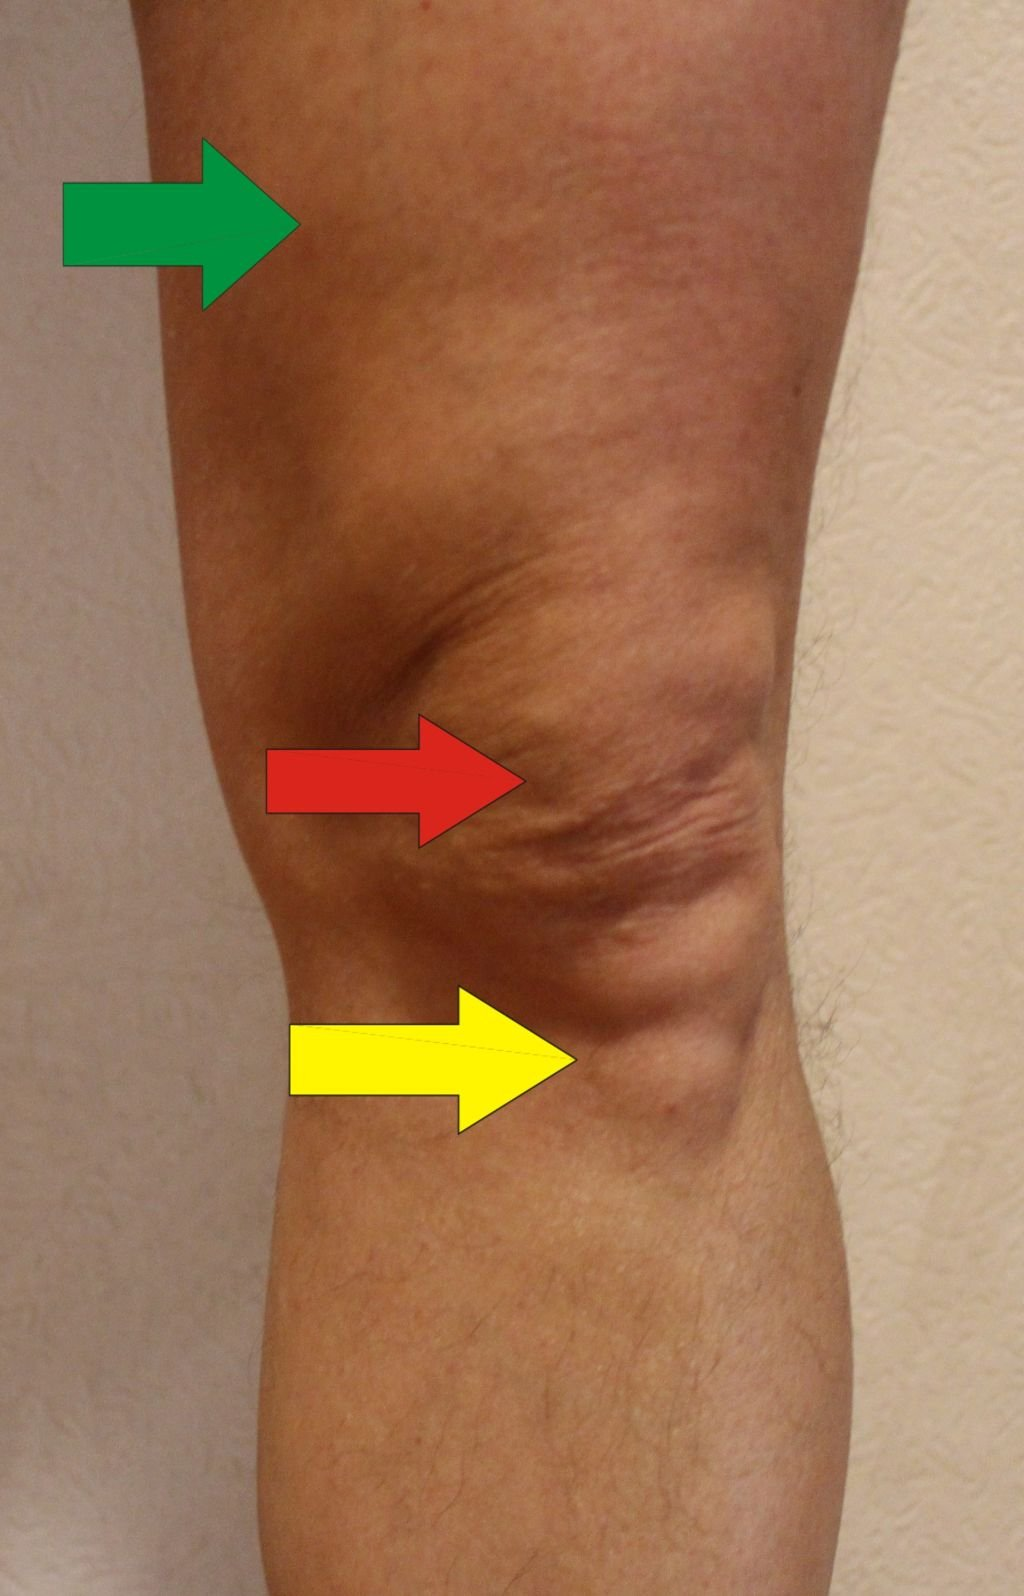 atherosklerose becken bein op